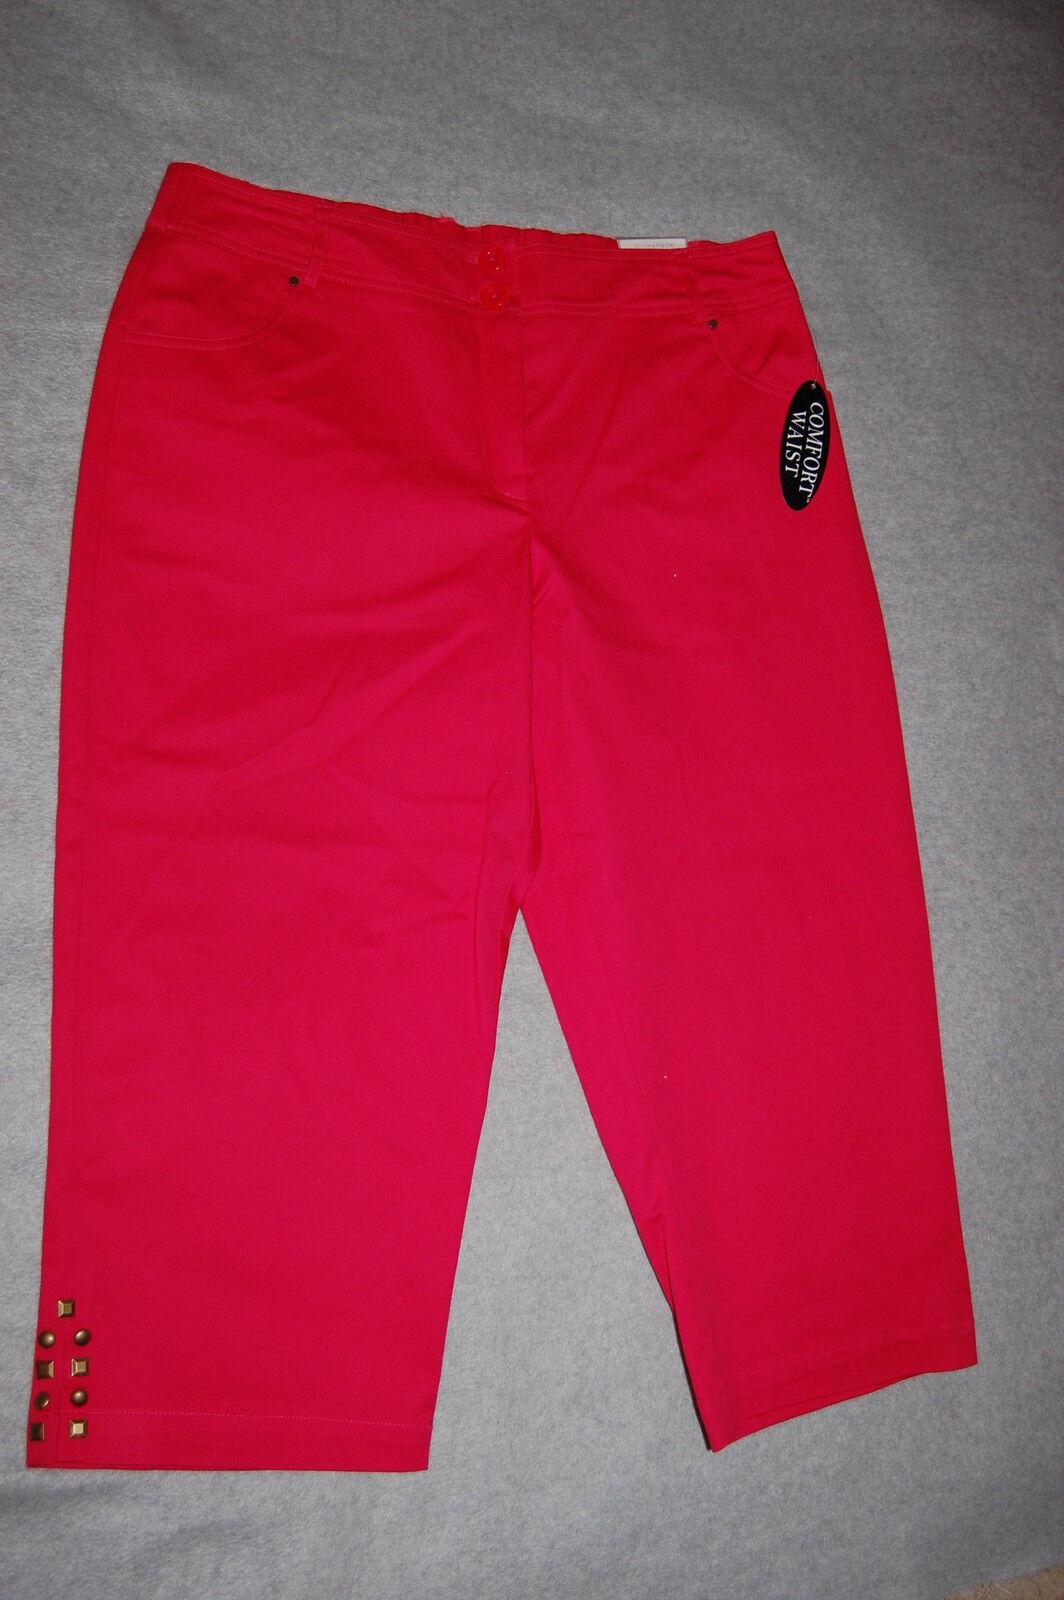 Womens Capris AZELEA RED orange Cropped Pants ELASTIC WAIST Zipper SIZE 22W